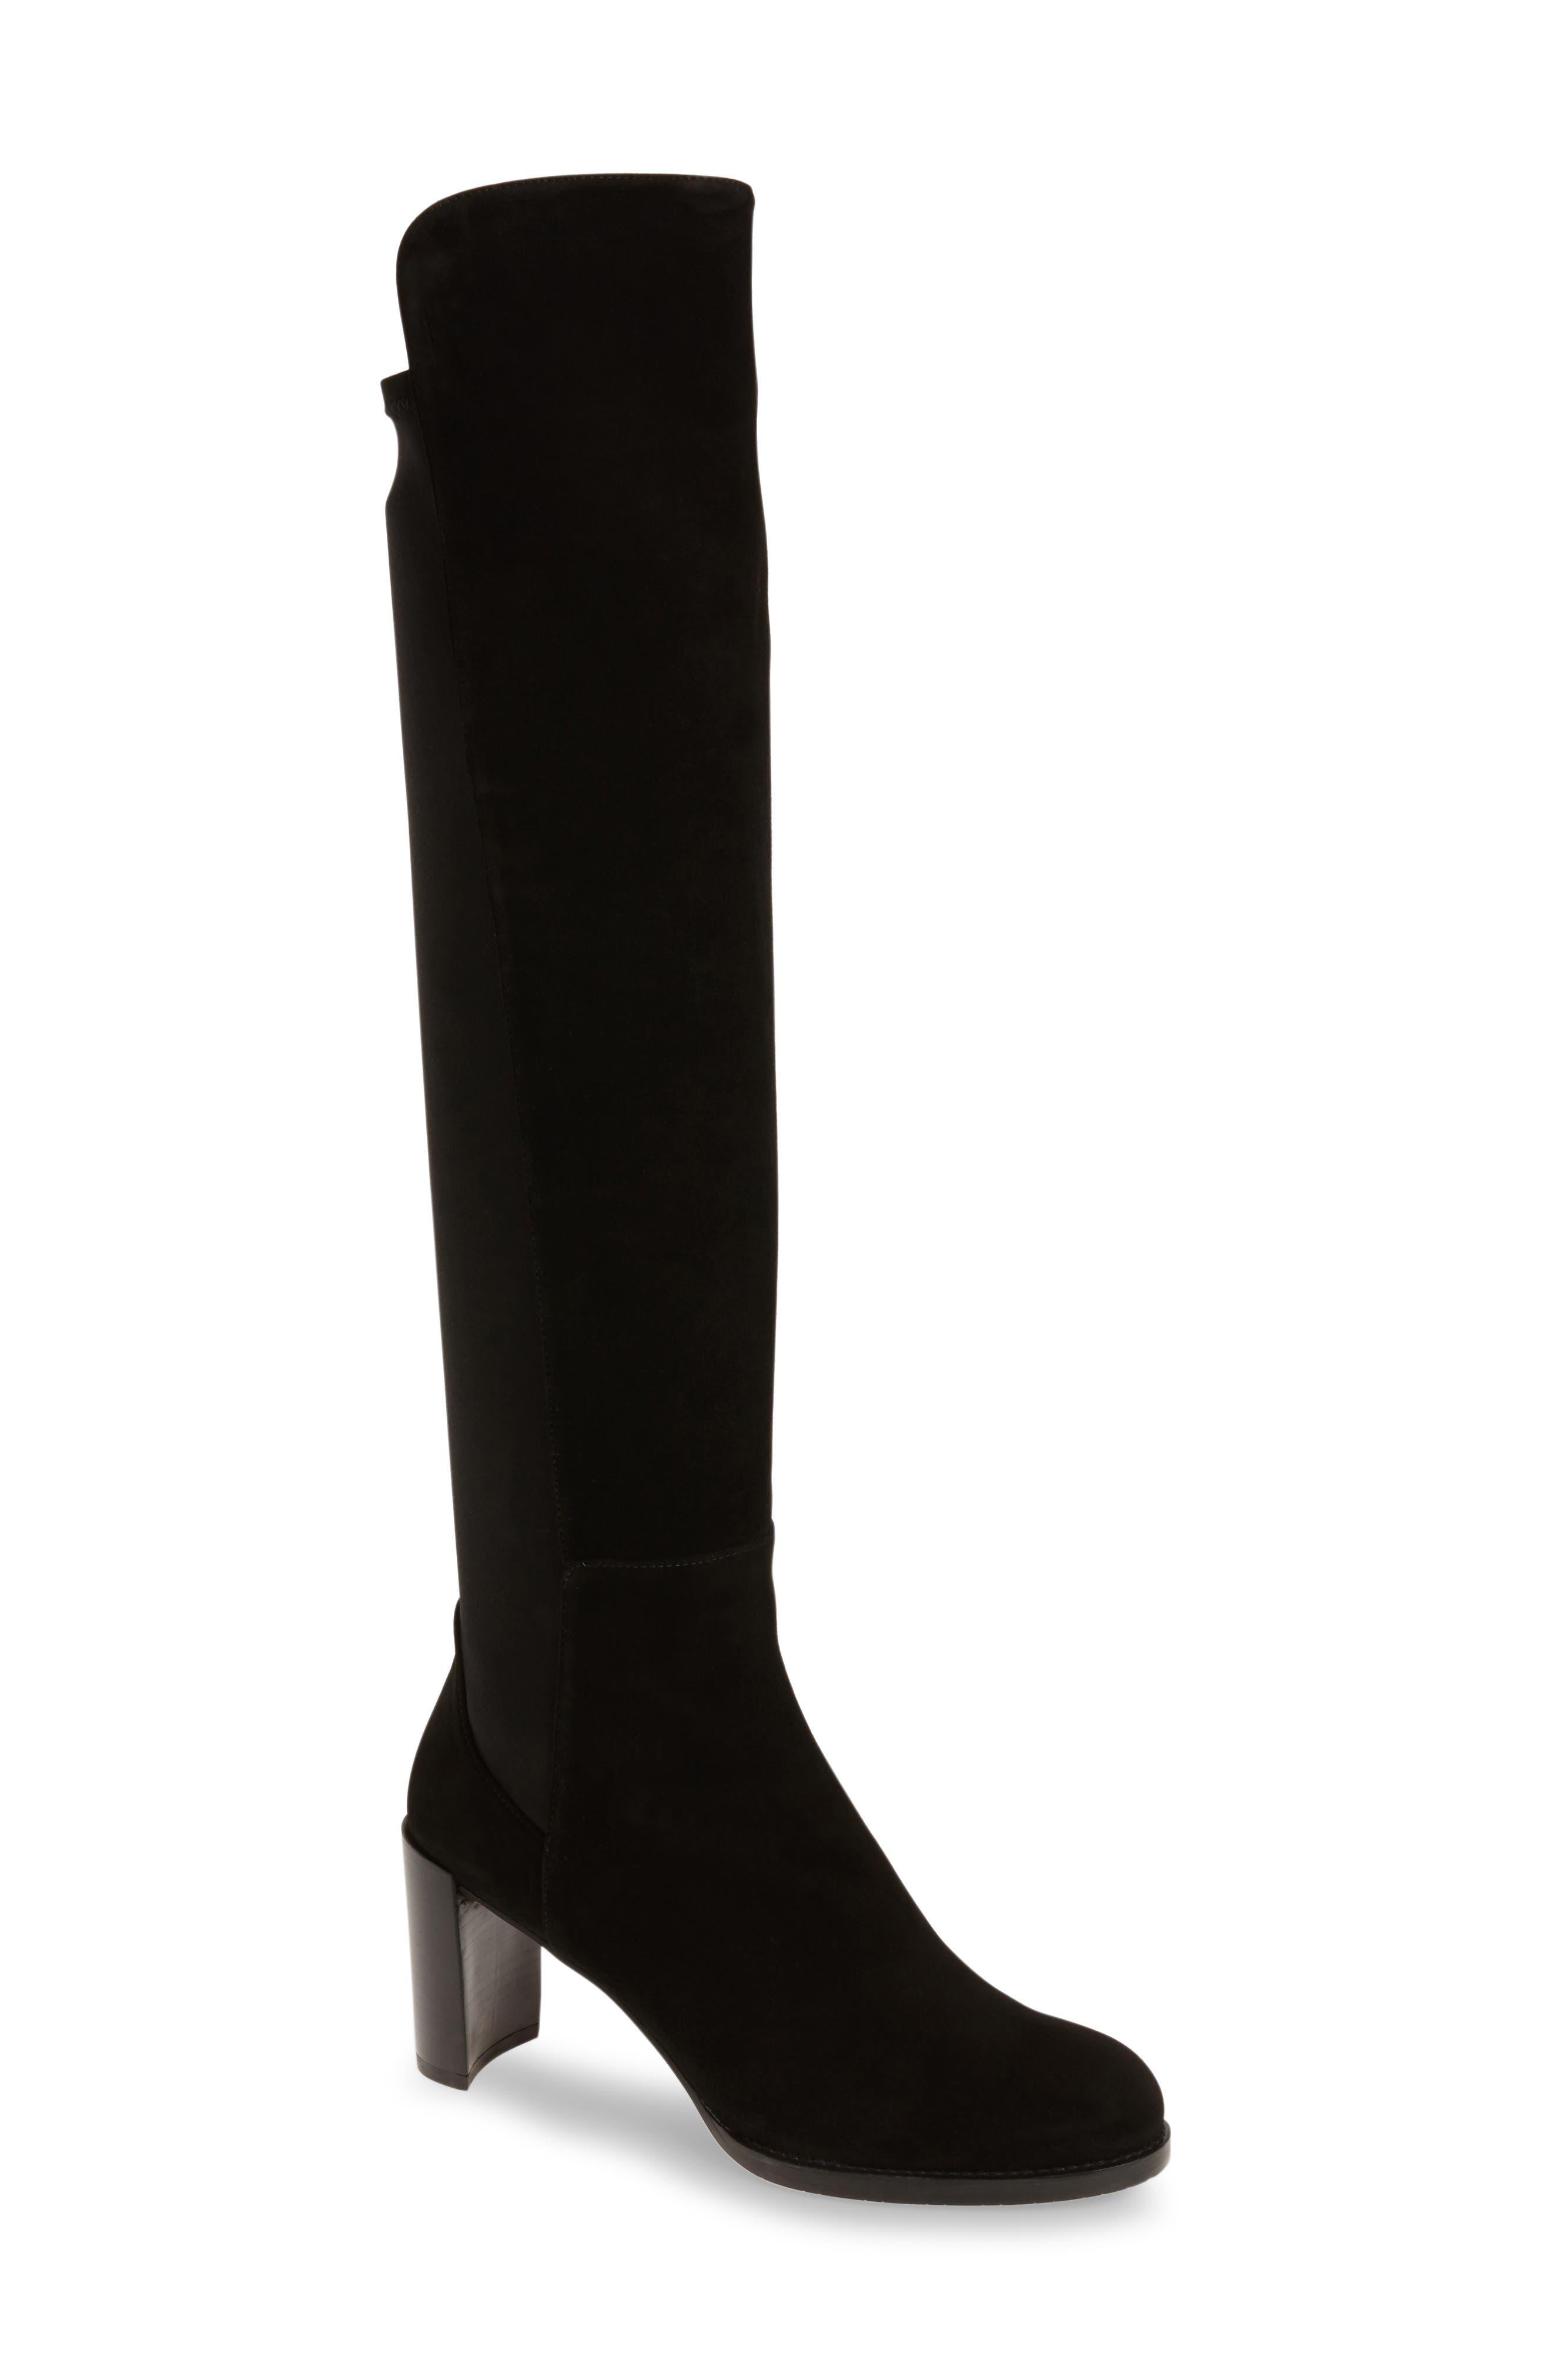 Main Image - Stuart Weitzman 'Soho' Tall Elastic Back Boot (Women) (Nordstrom Exclusive)